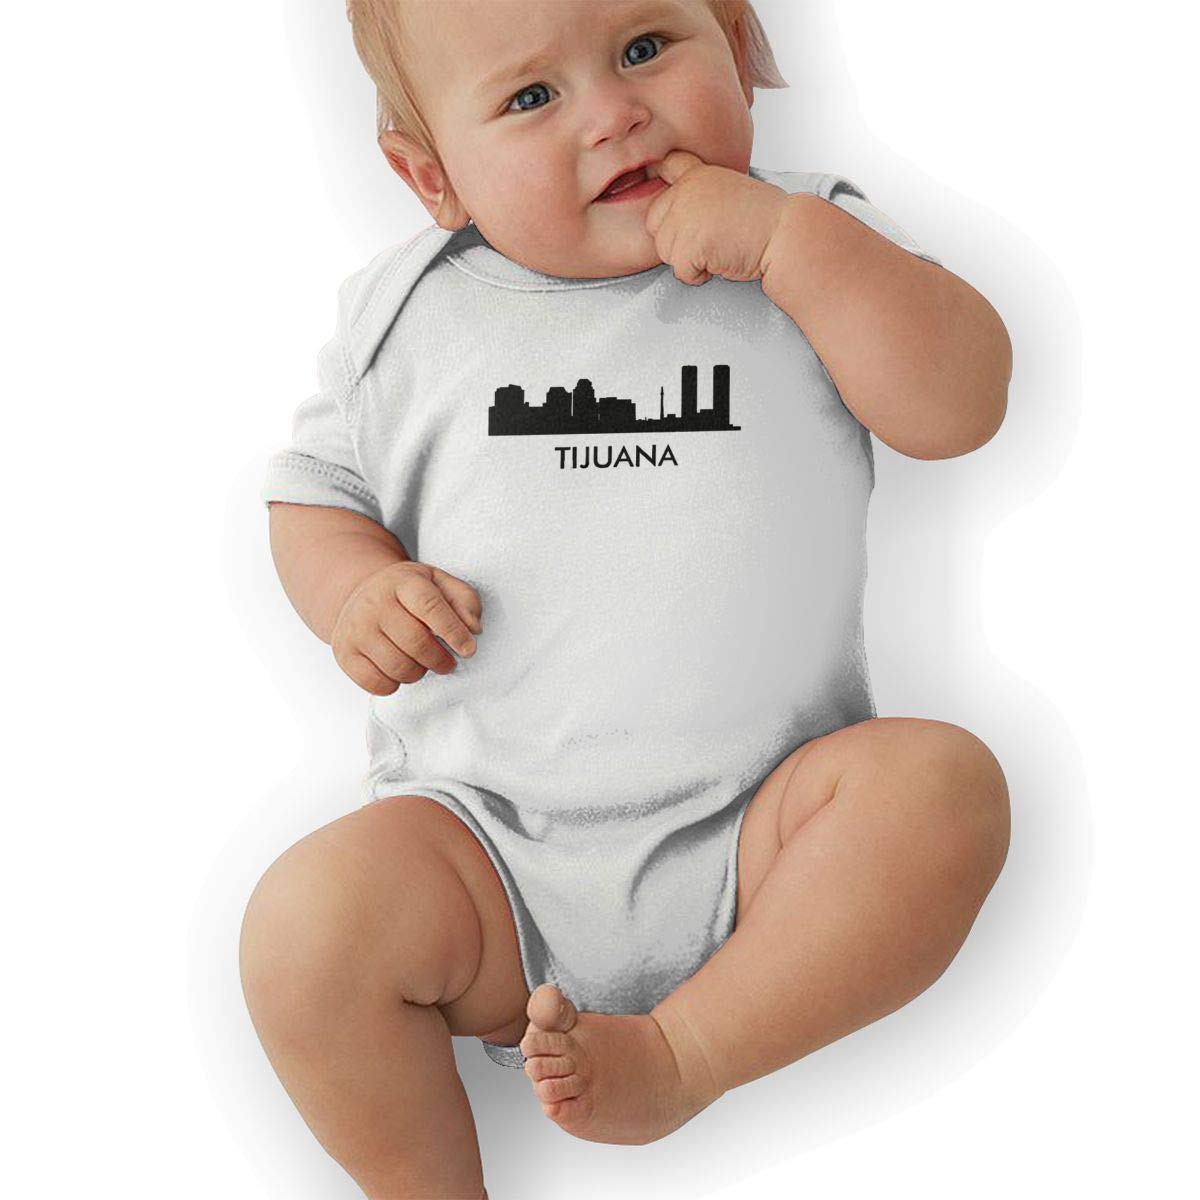 Tijuana City Skylines Silhouettes Baby Romper 0-18 Months Newborn Baby Girls Boys Layette Rompers White